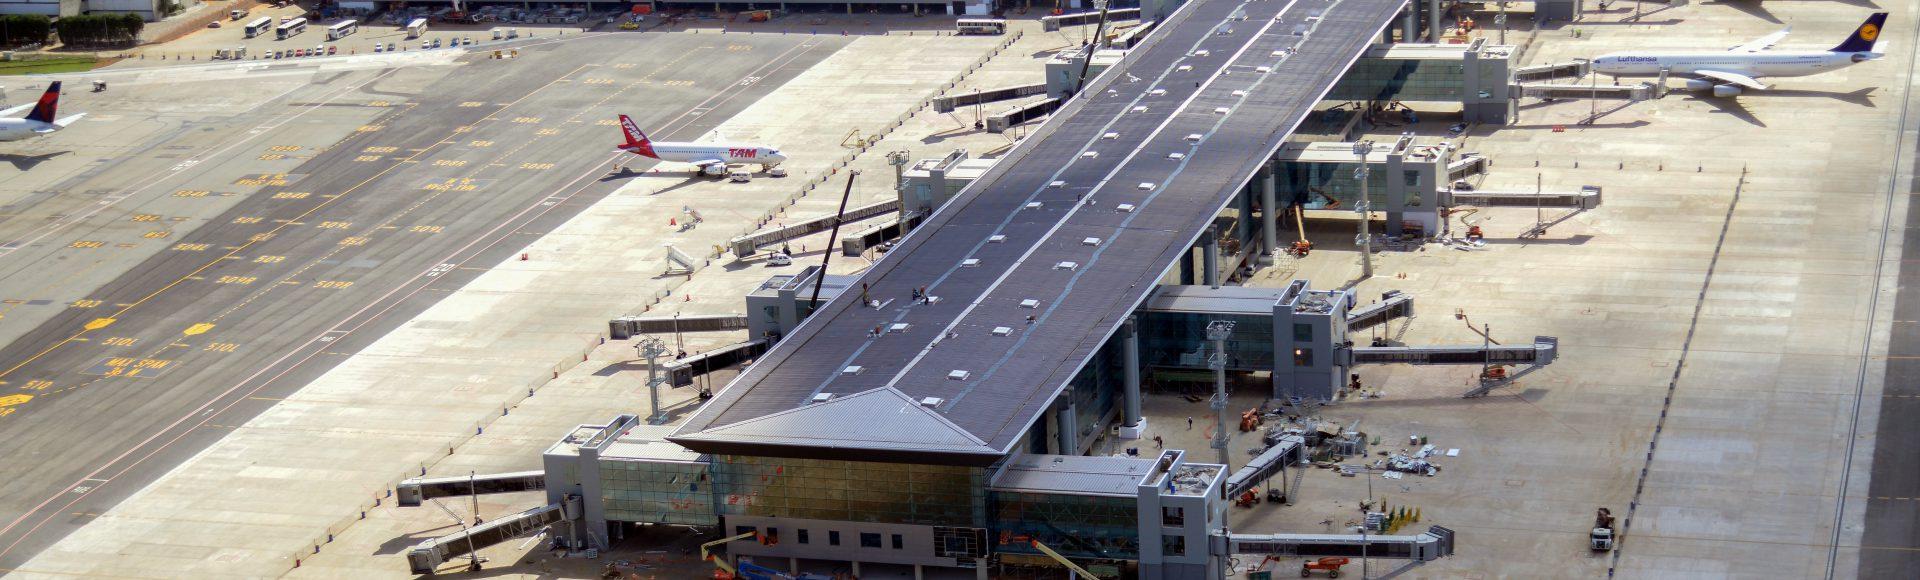 Terminal_3_de_Guarulhos